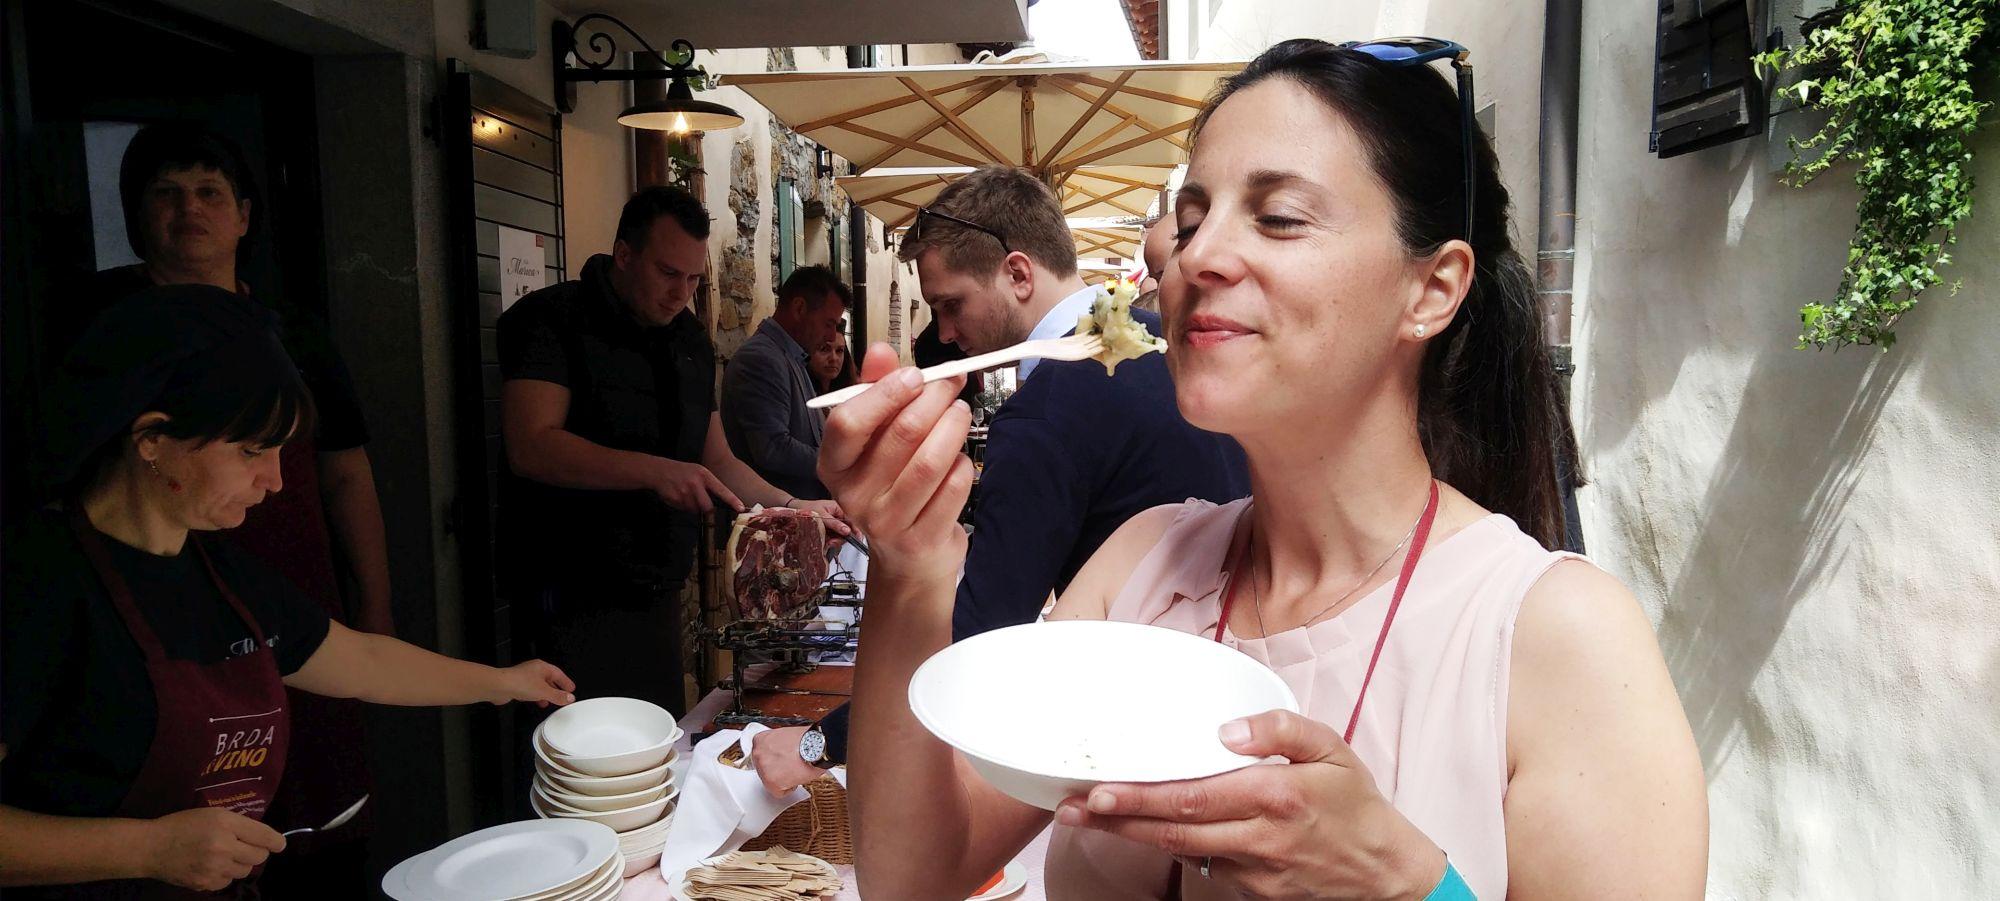 Denise of Wine Dine Slovenia enjoys some food at BRDA&VINO food and wine festival